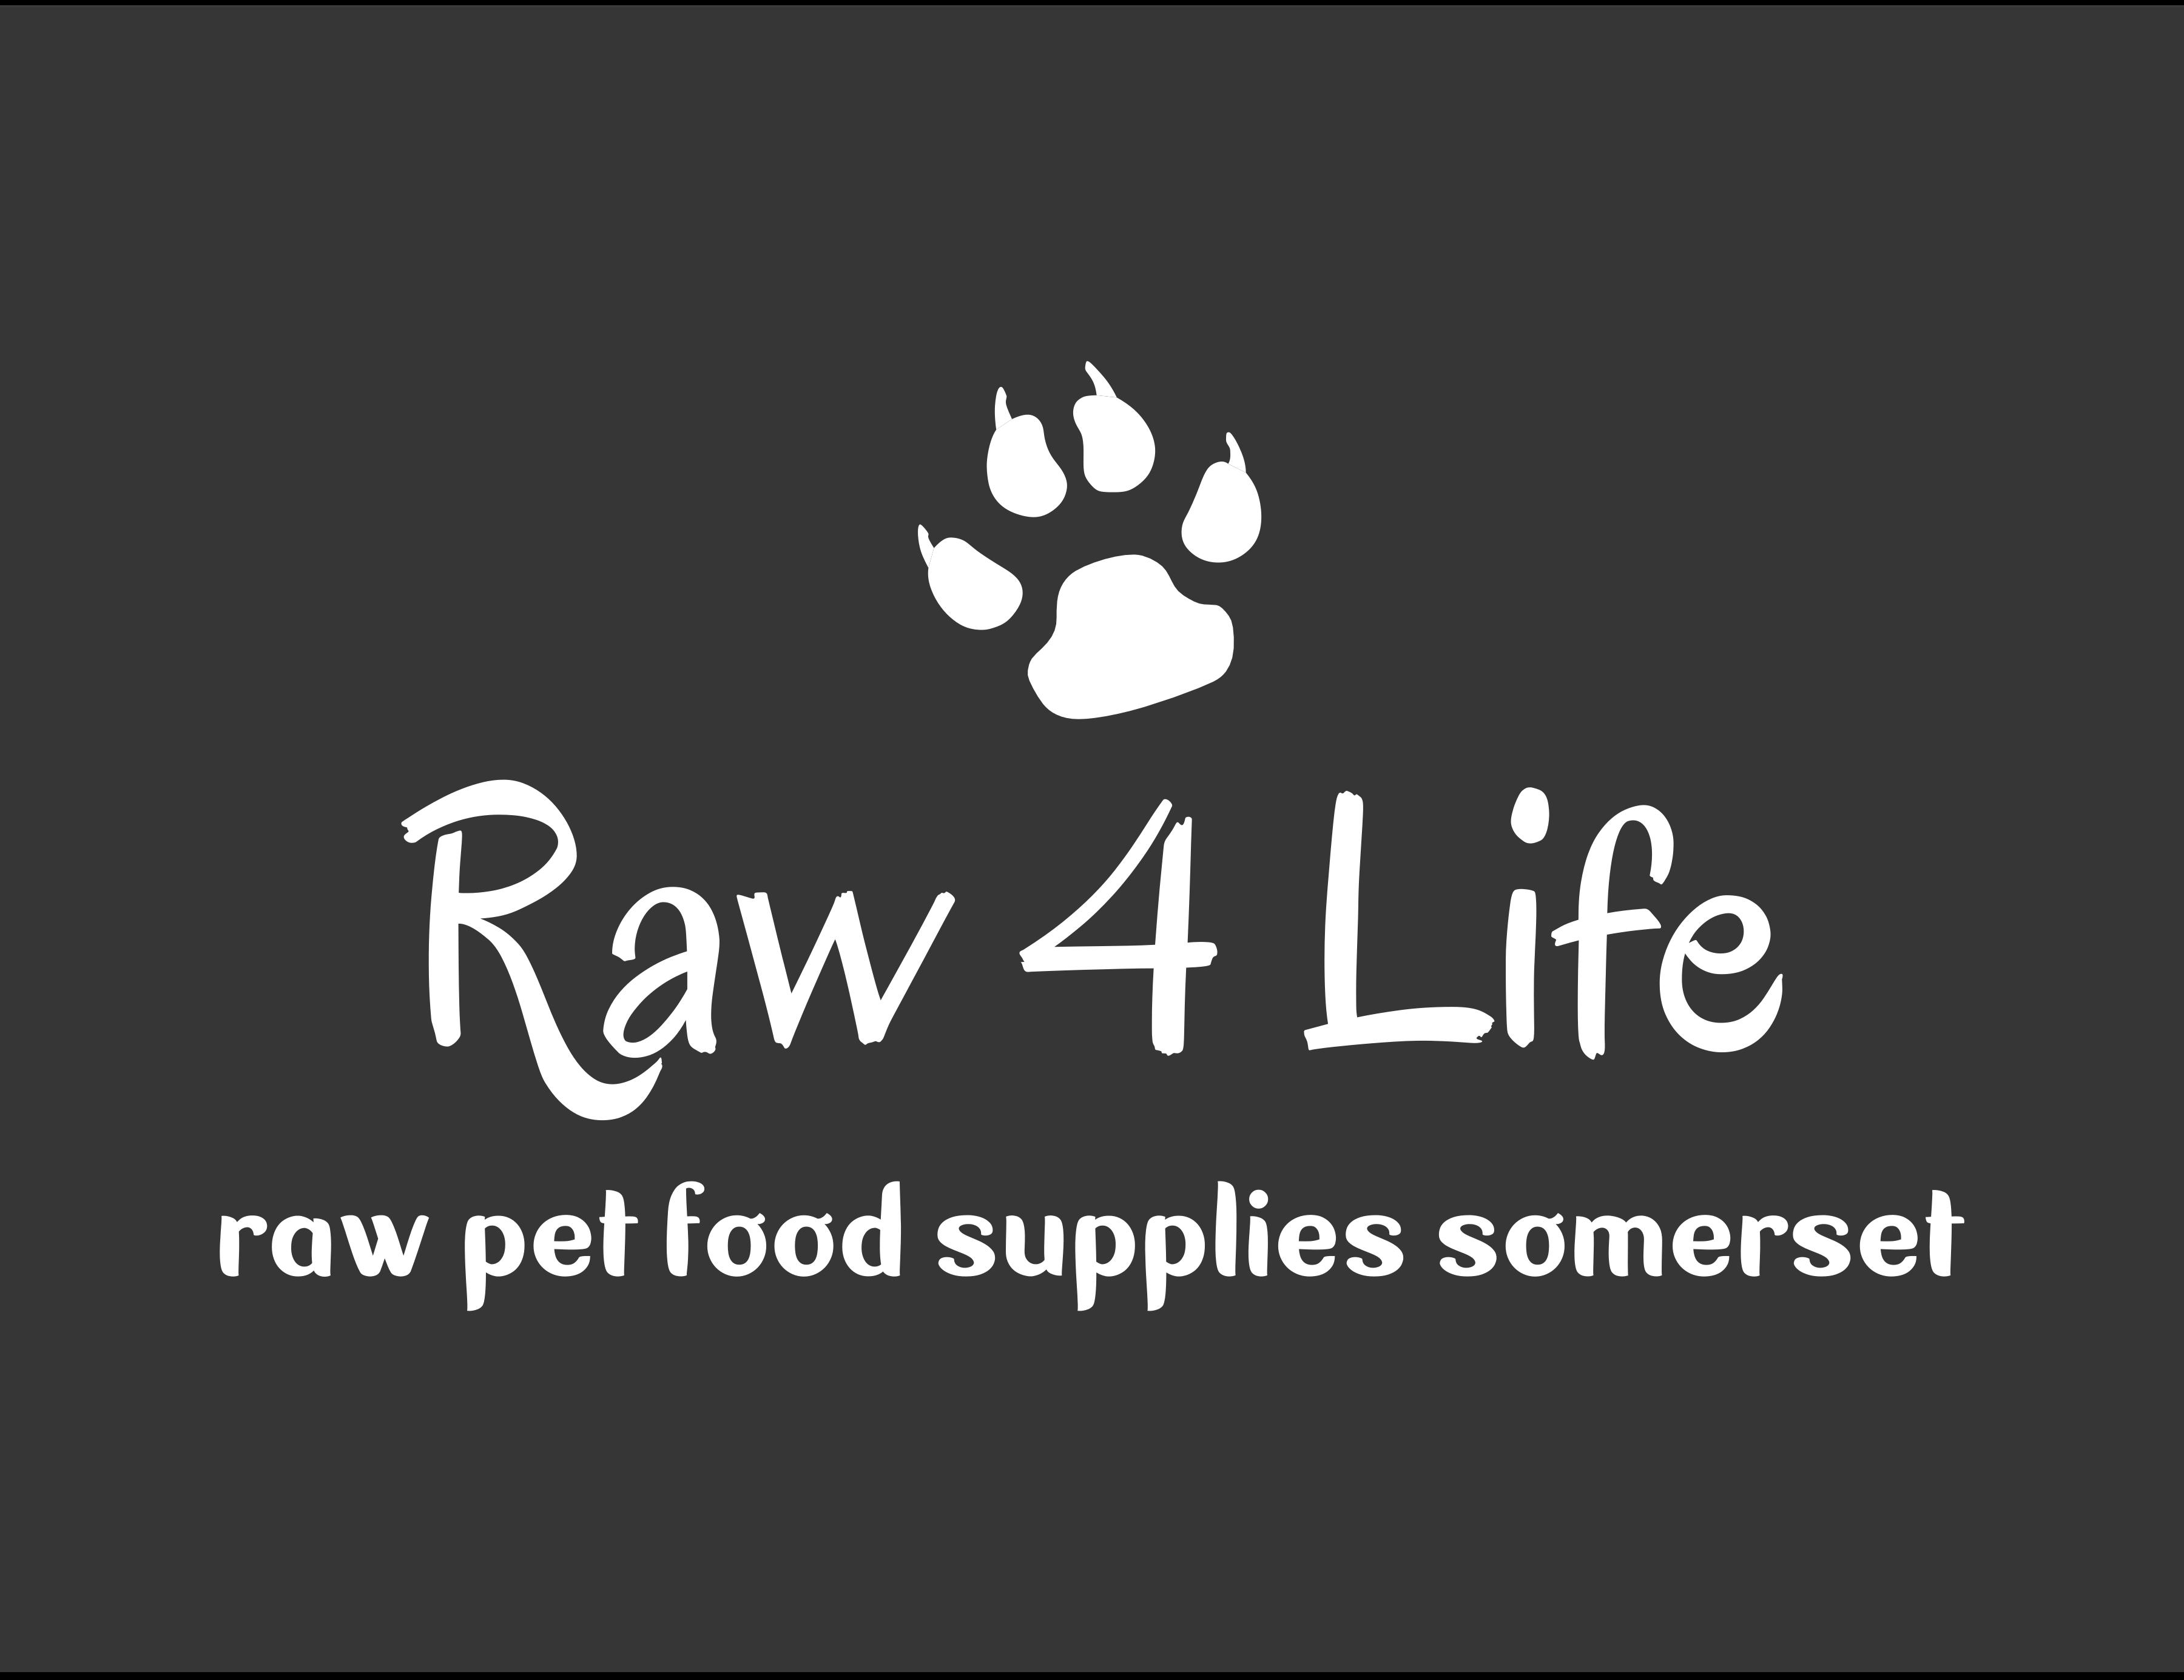 Raw 4 Life Somerset